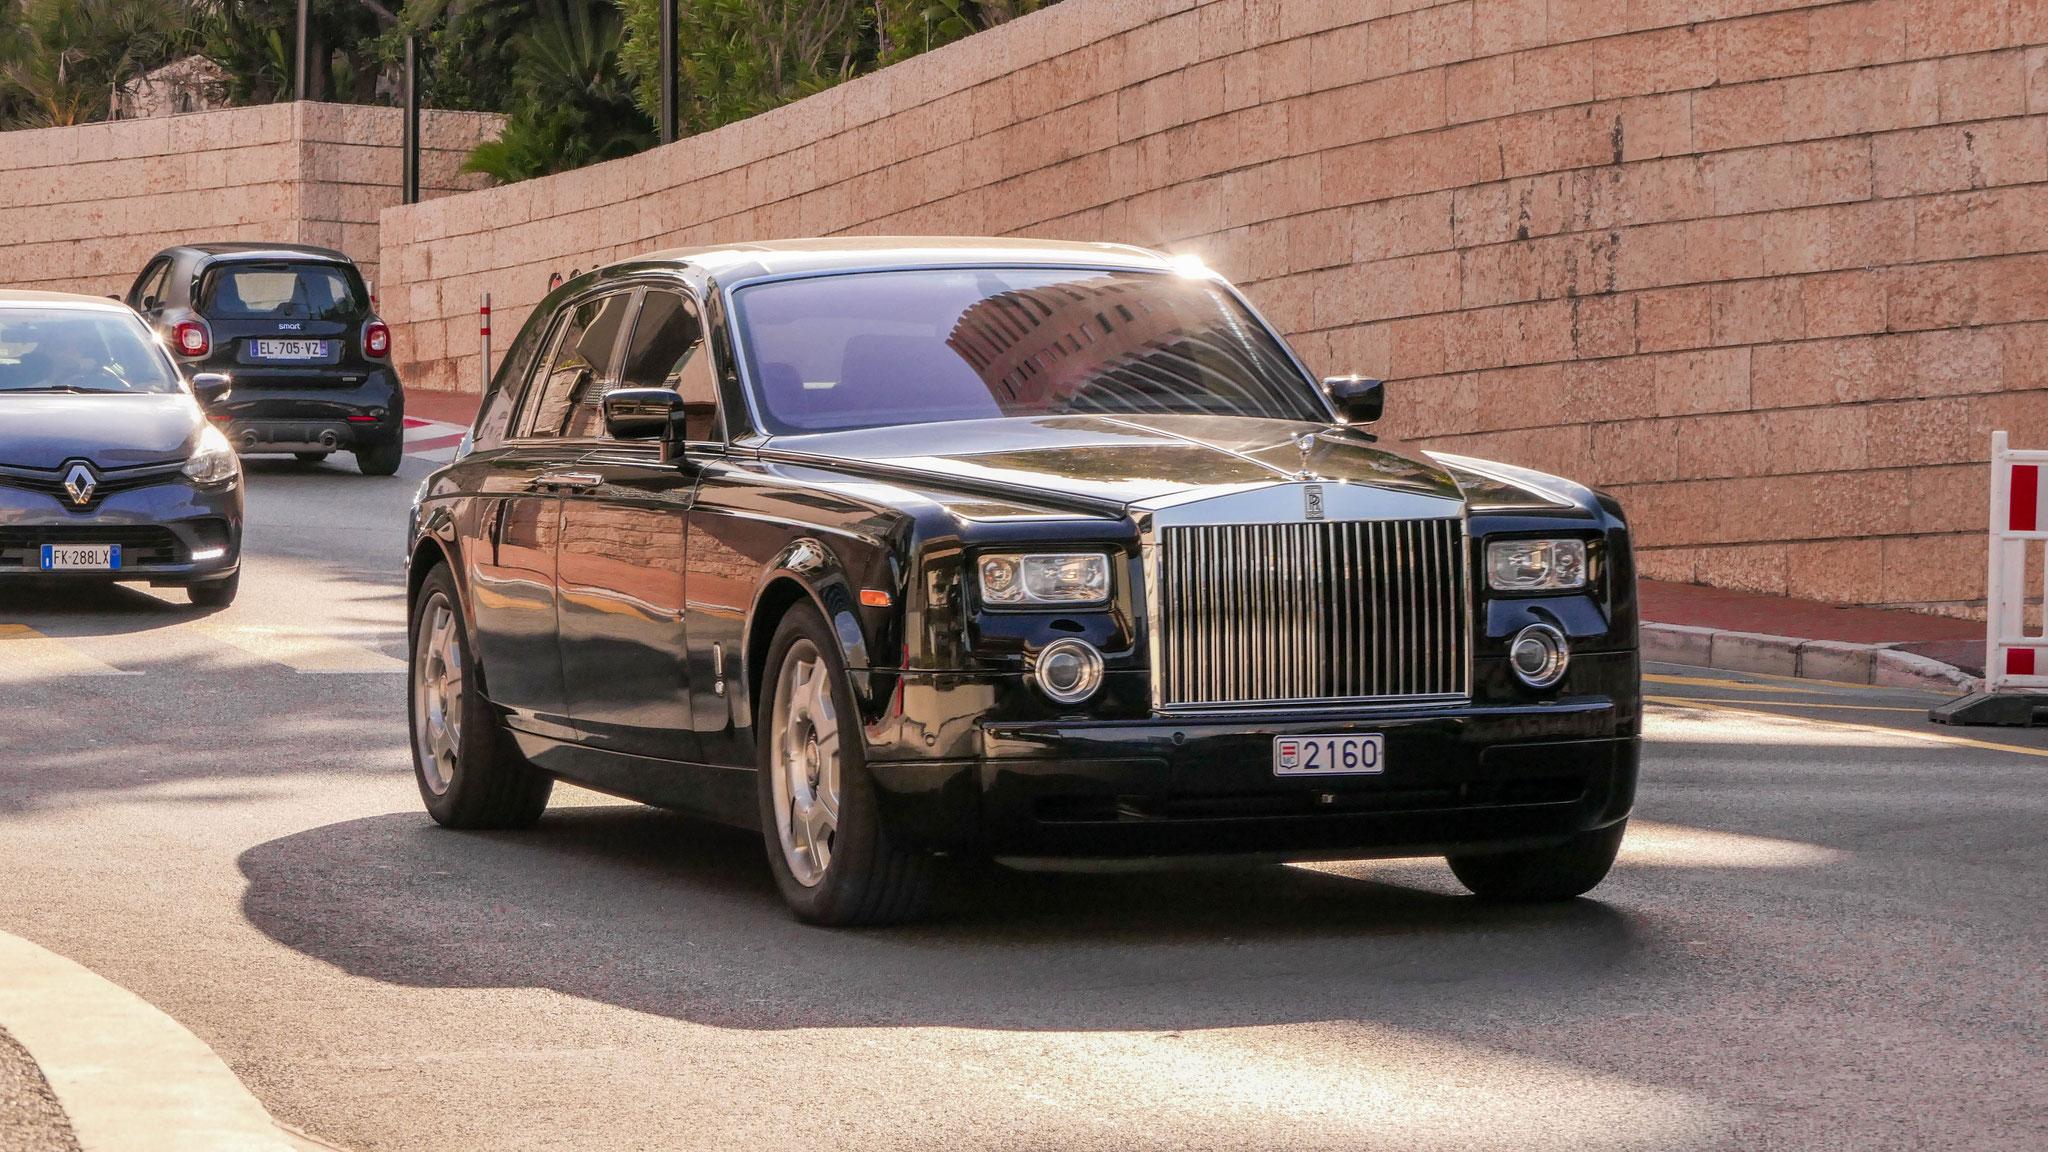 Rolls Royce Phantom - 2160 (MC)